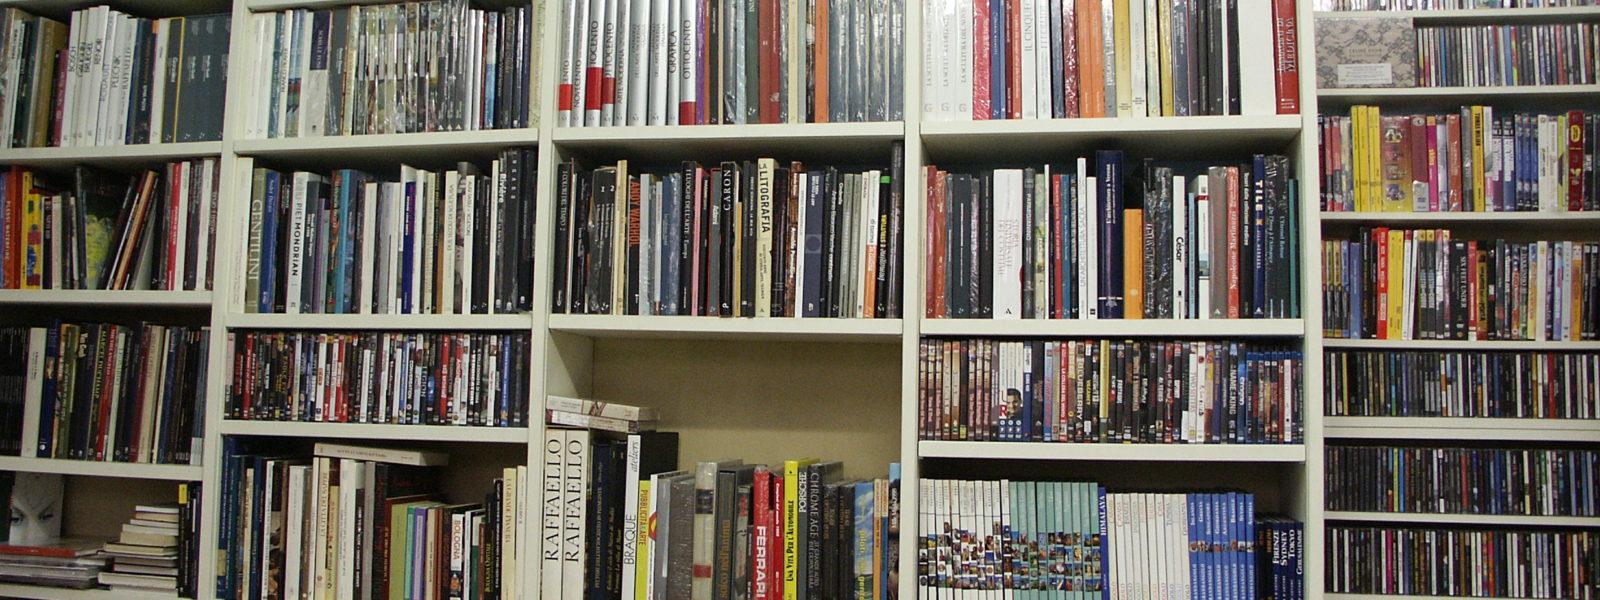 Libreria Lorici